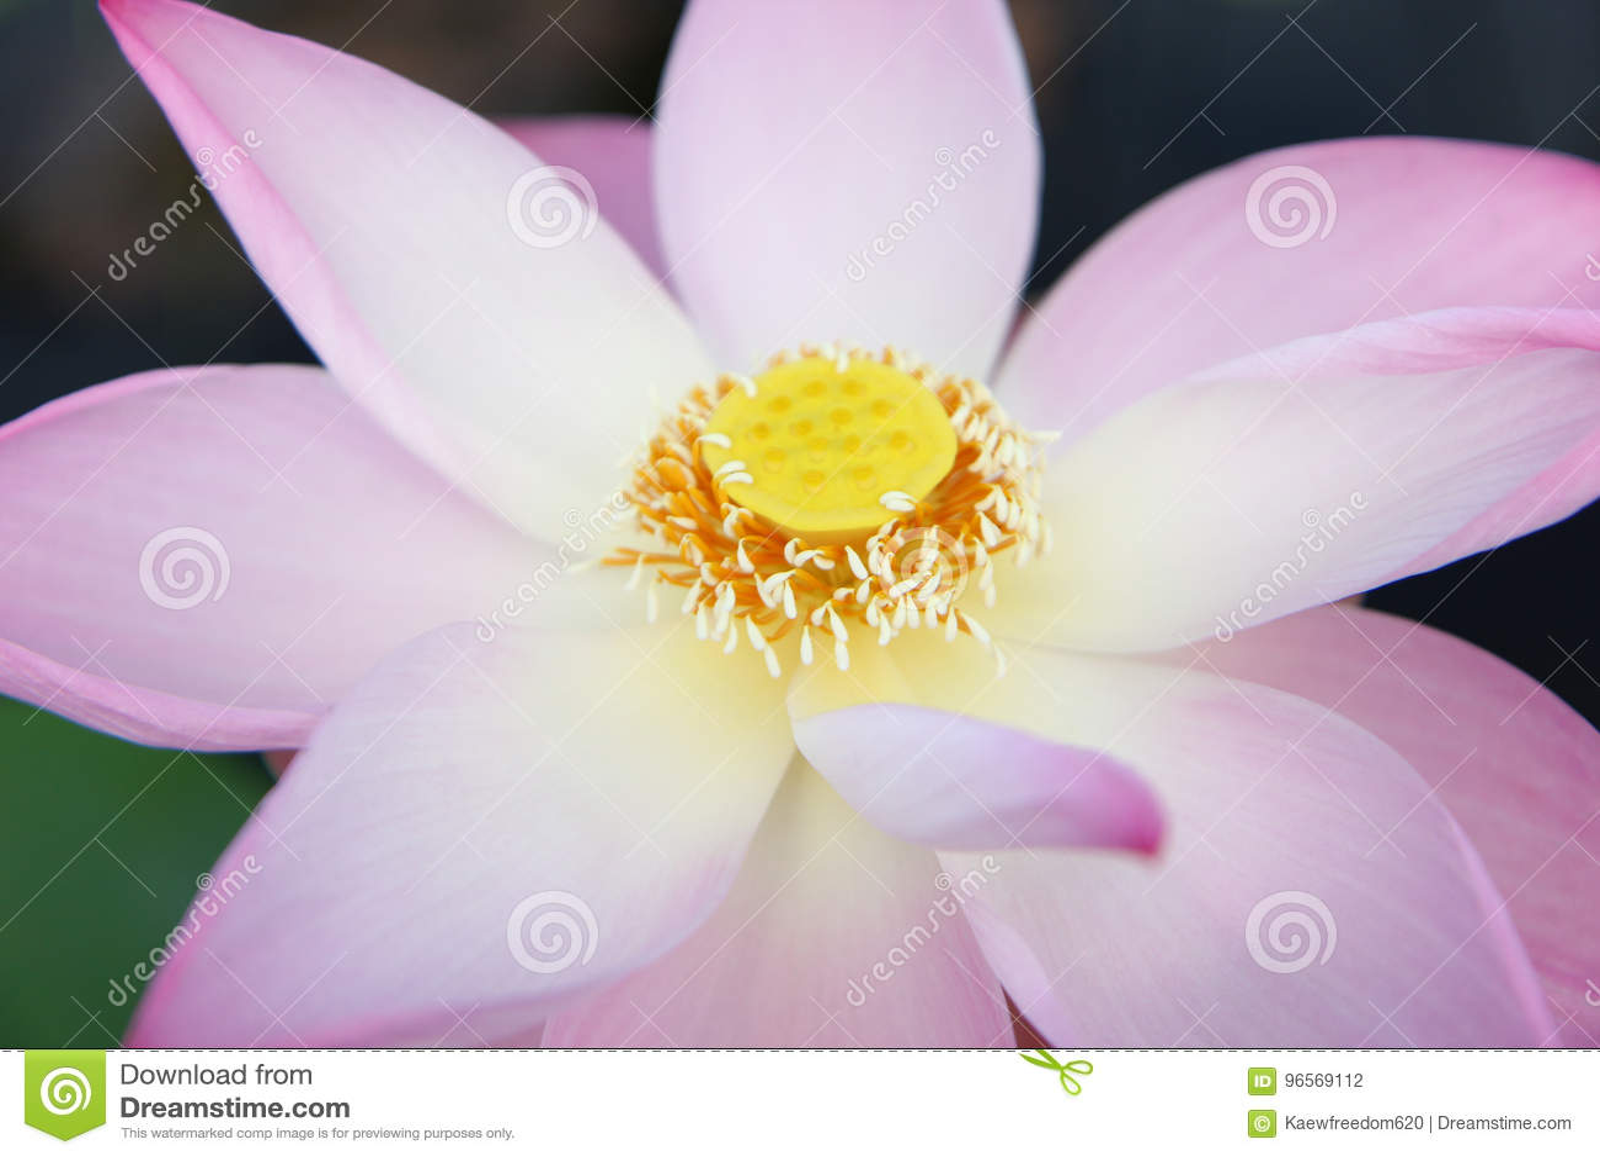 Beautiful Lotus Flower Stock Photo Image Of Pollen Like 96569112